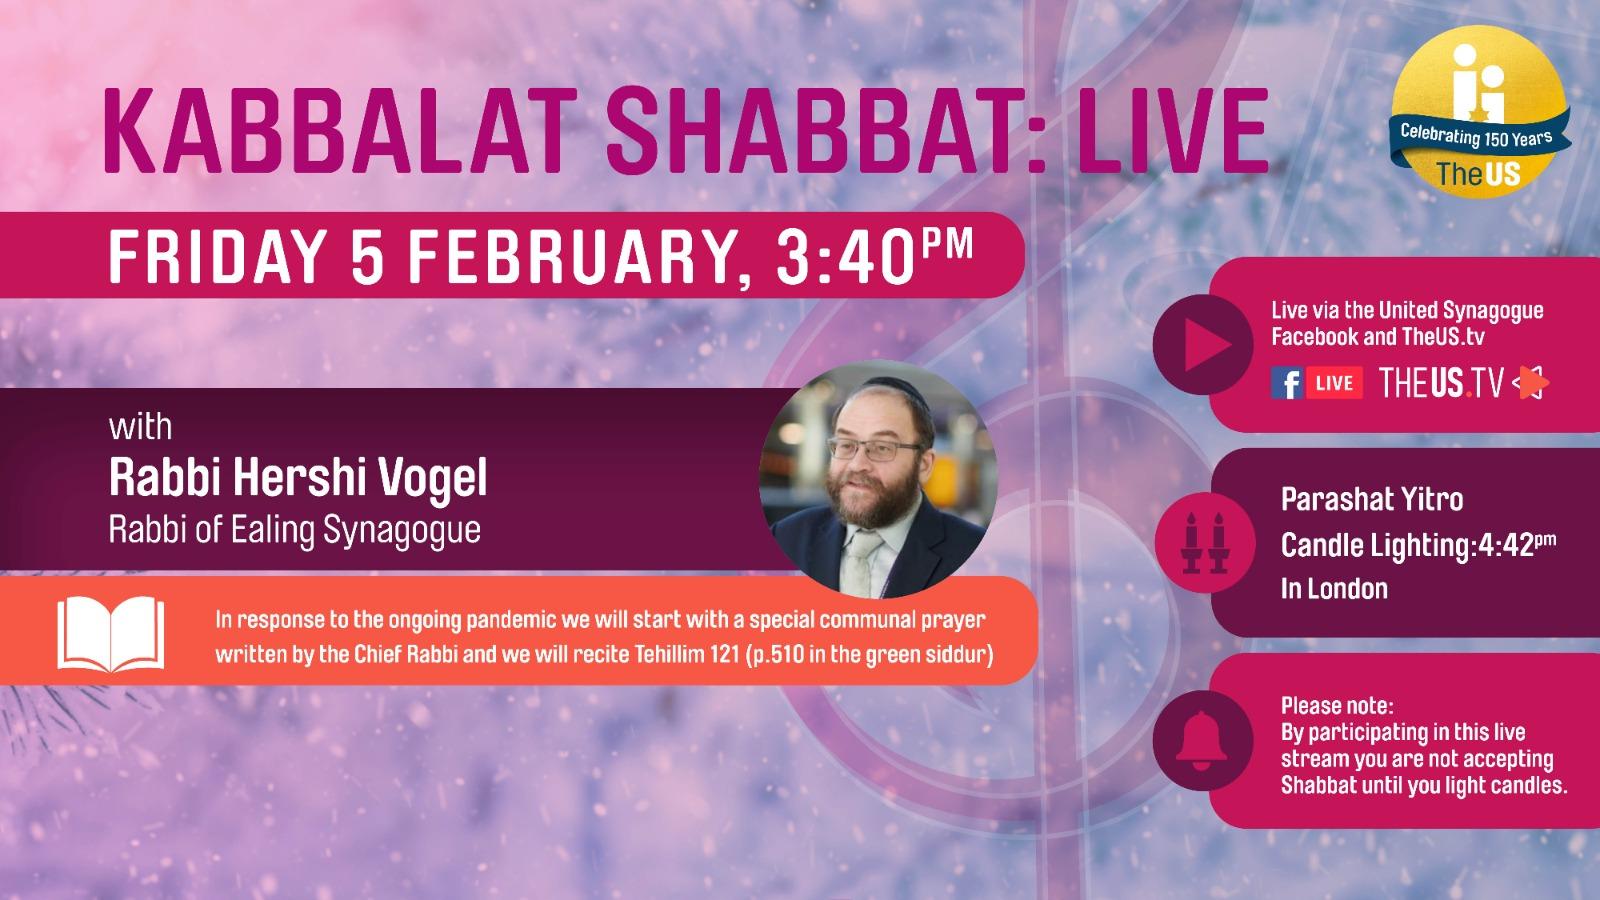 Kabbalat Shabbat: Live at 3:40pm